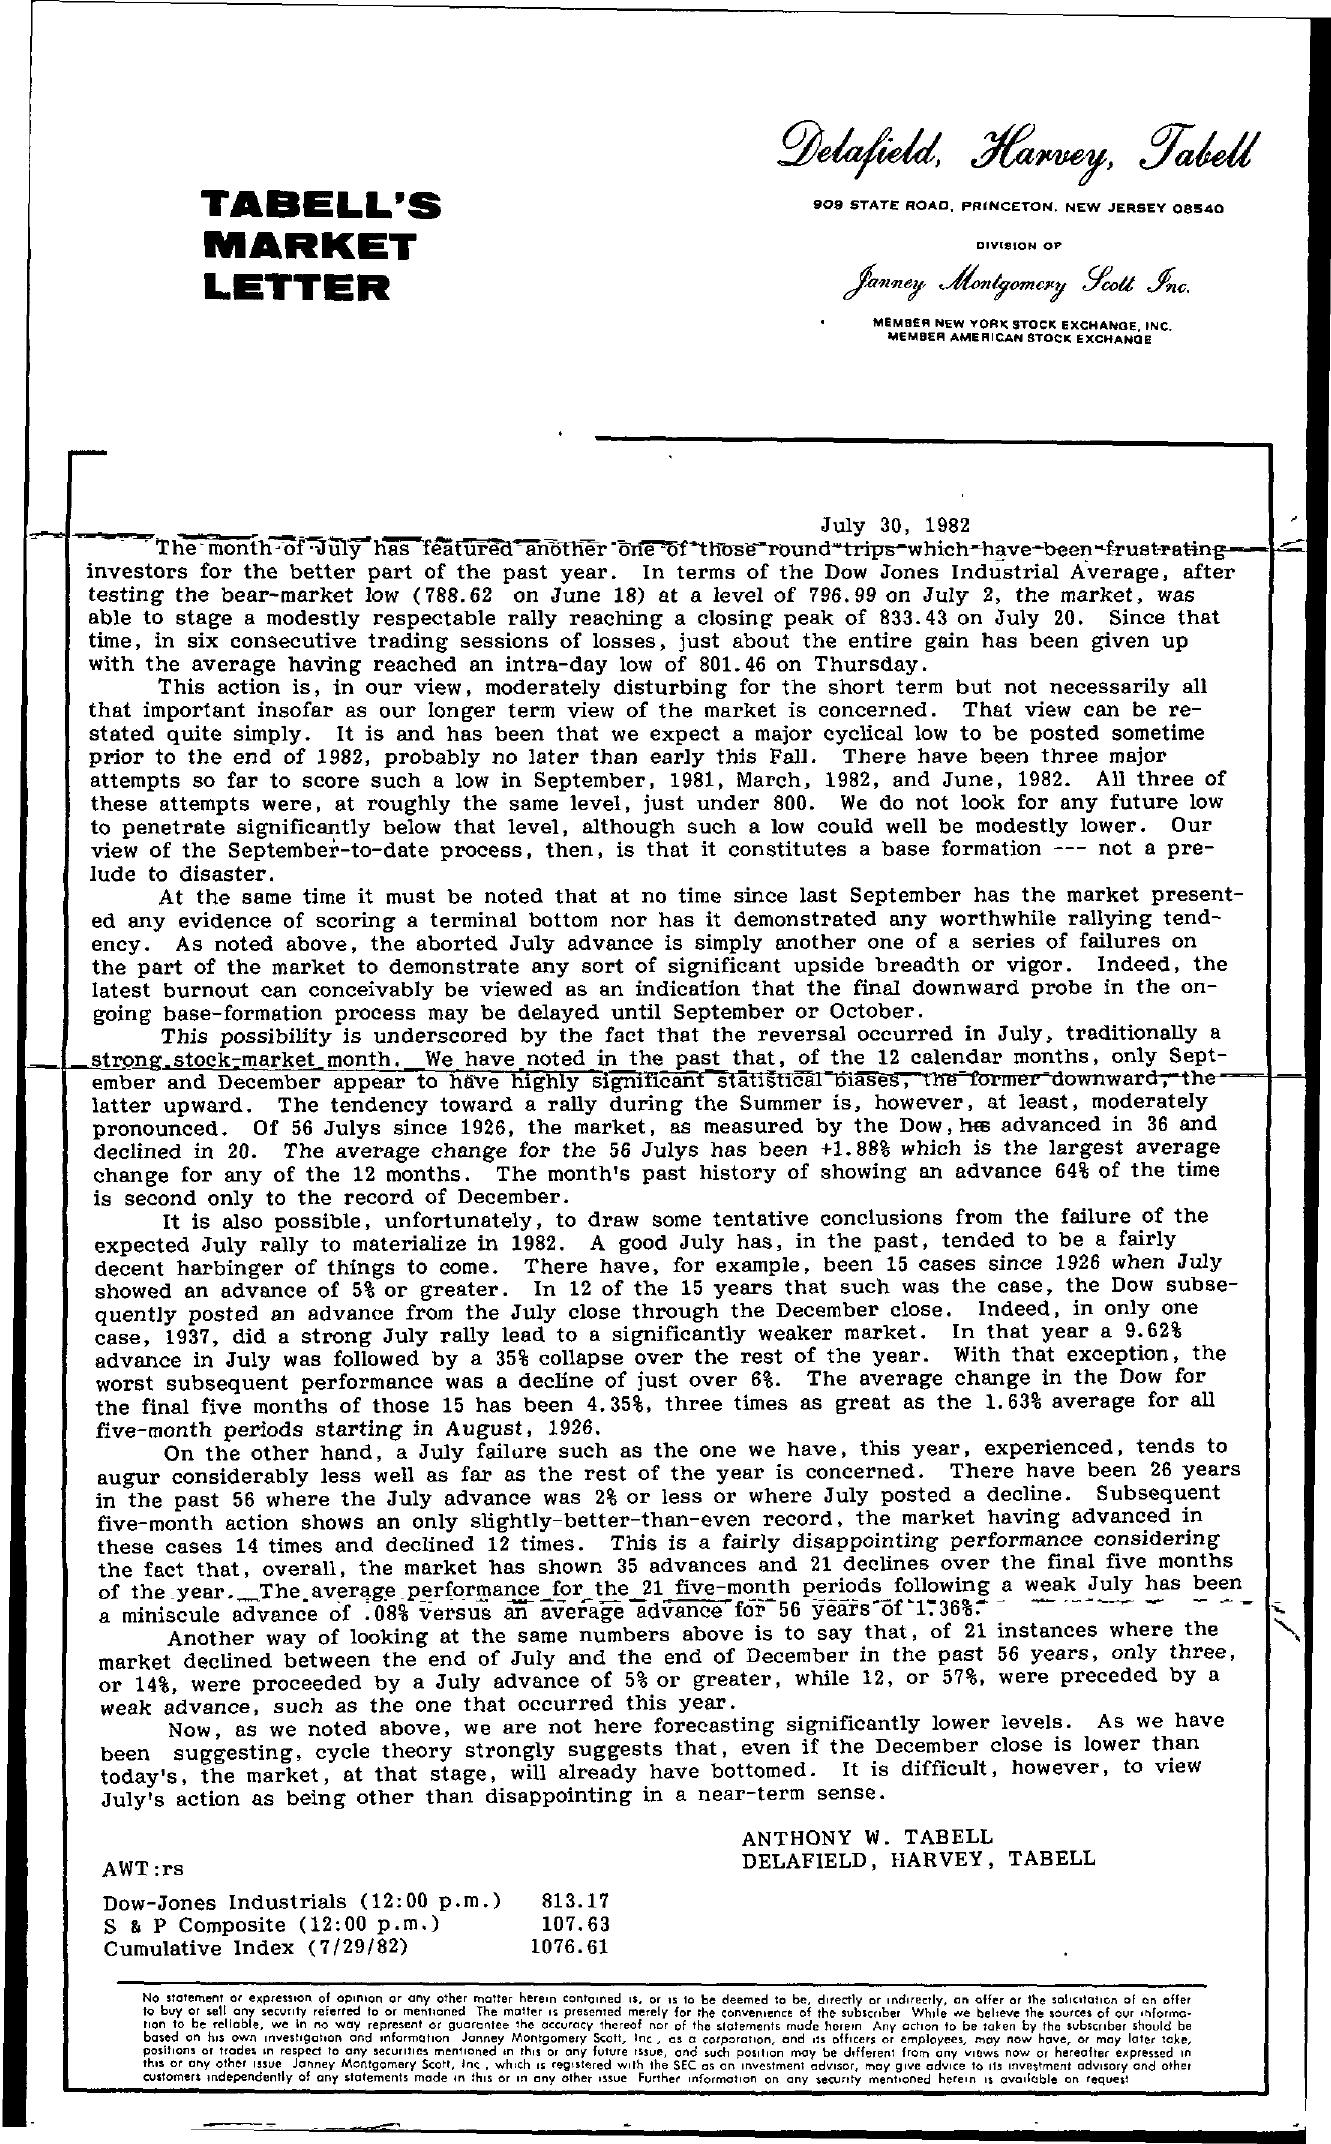 Tabell's Market Letter - July 30, 1982